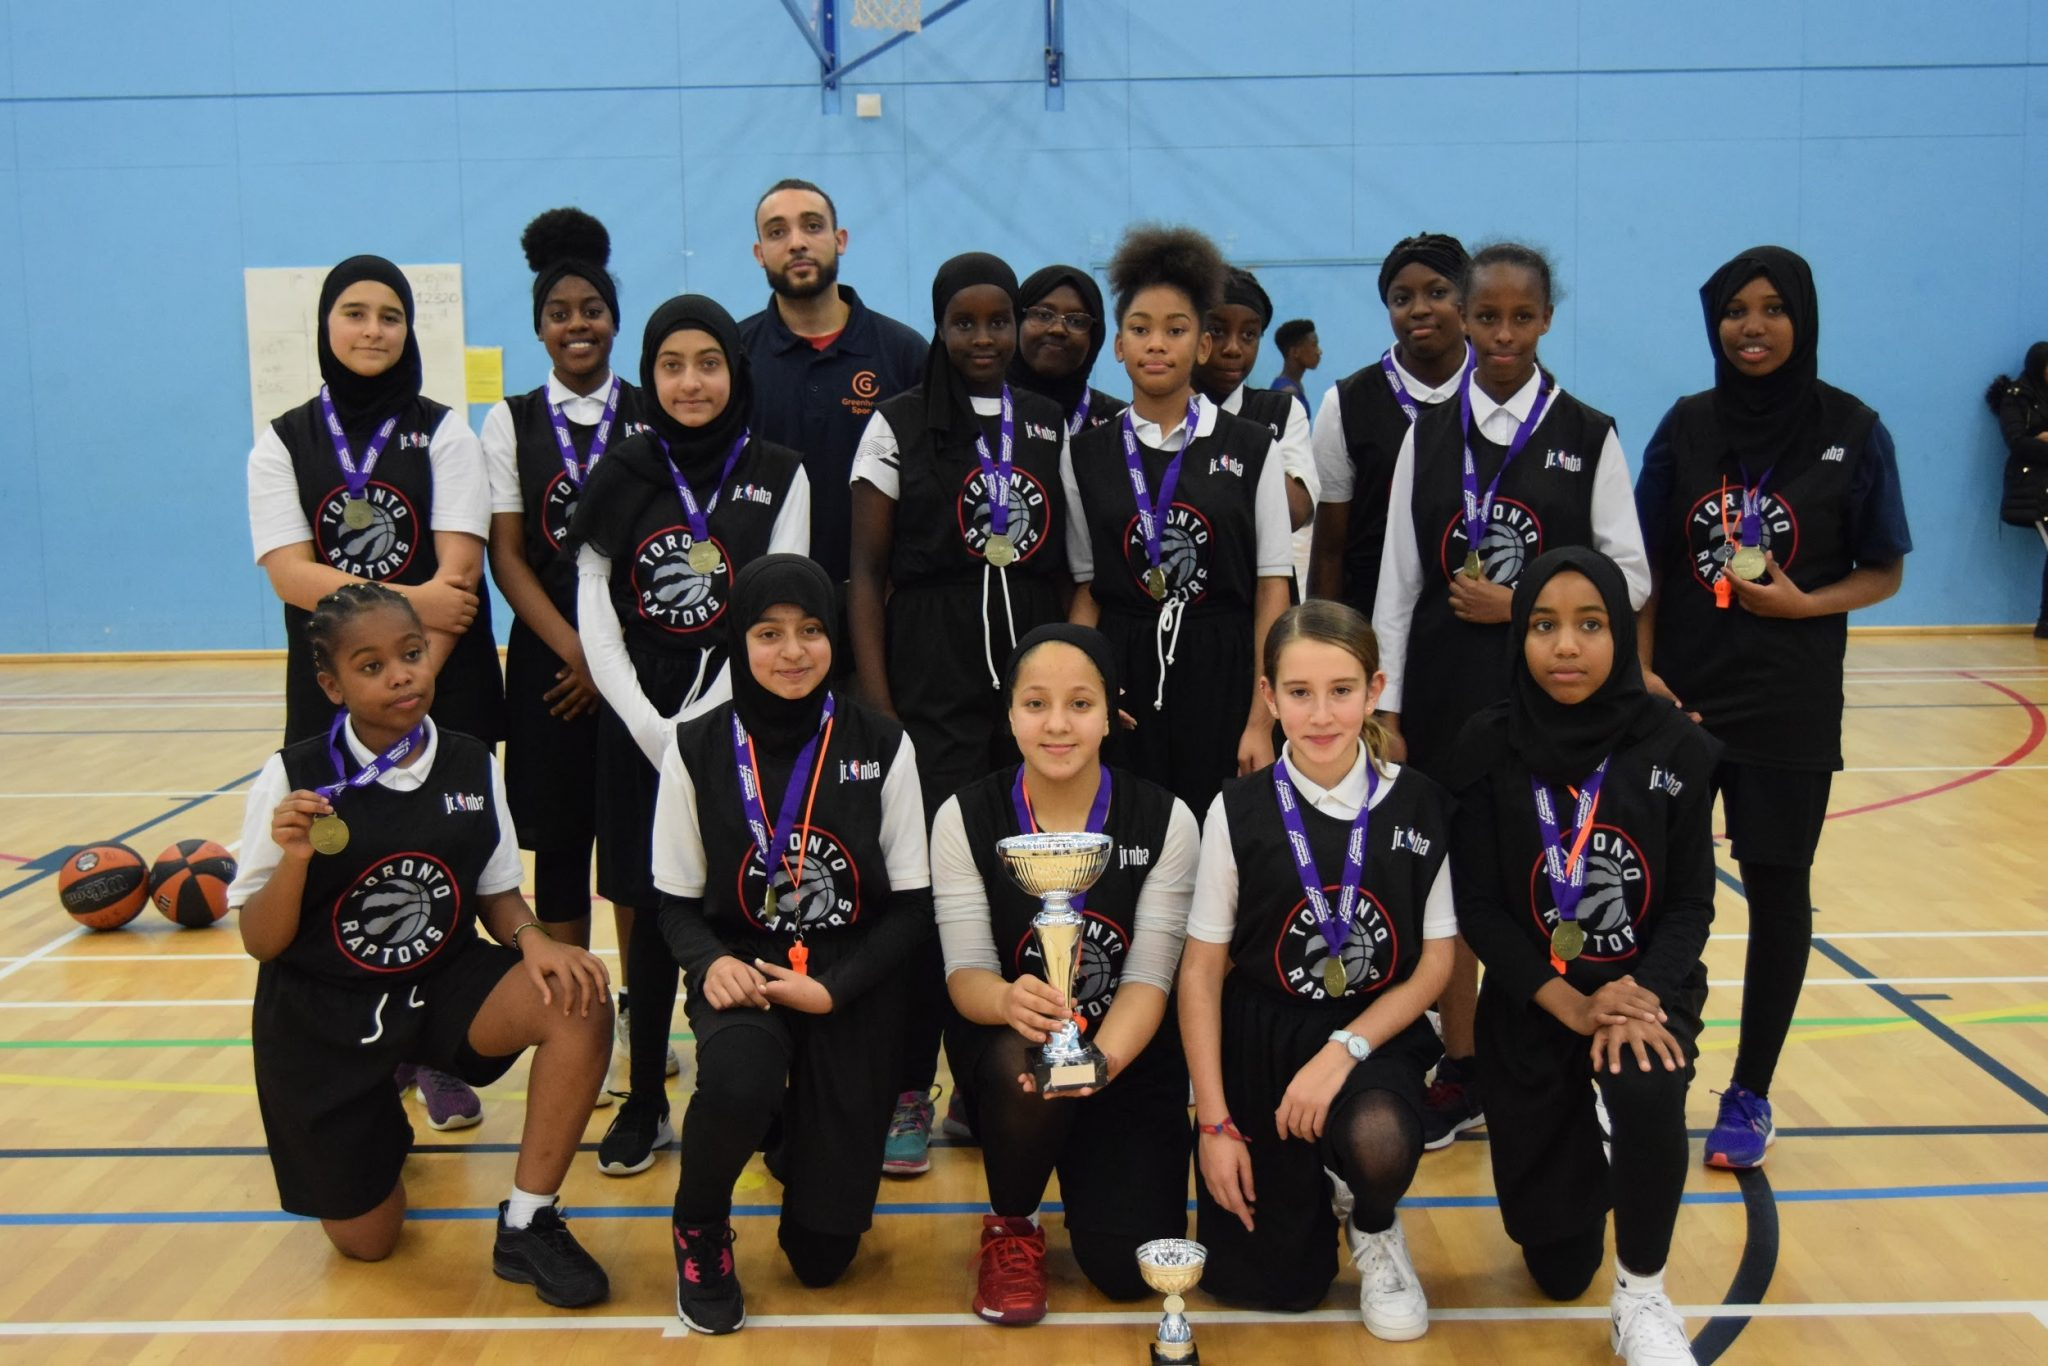 Brent U14 Girls Champions: Crest Academy